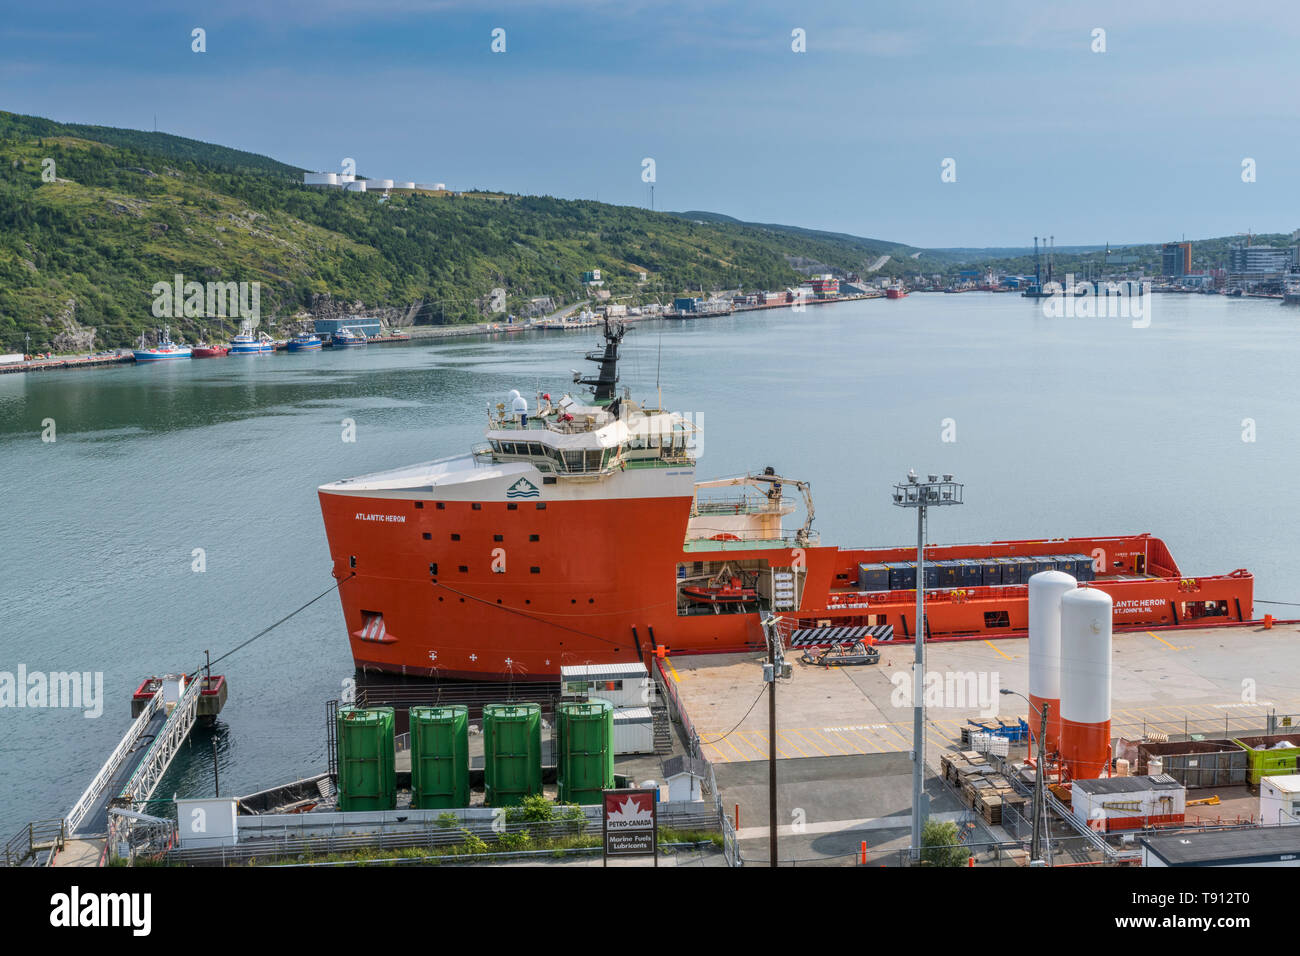 Atlantic Heron offshore supply ship docked in St. John's, Newfoundland, Canada, Summer 2018 - Stock Image